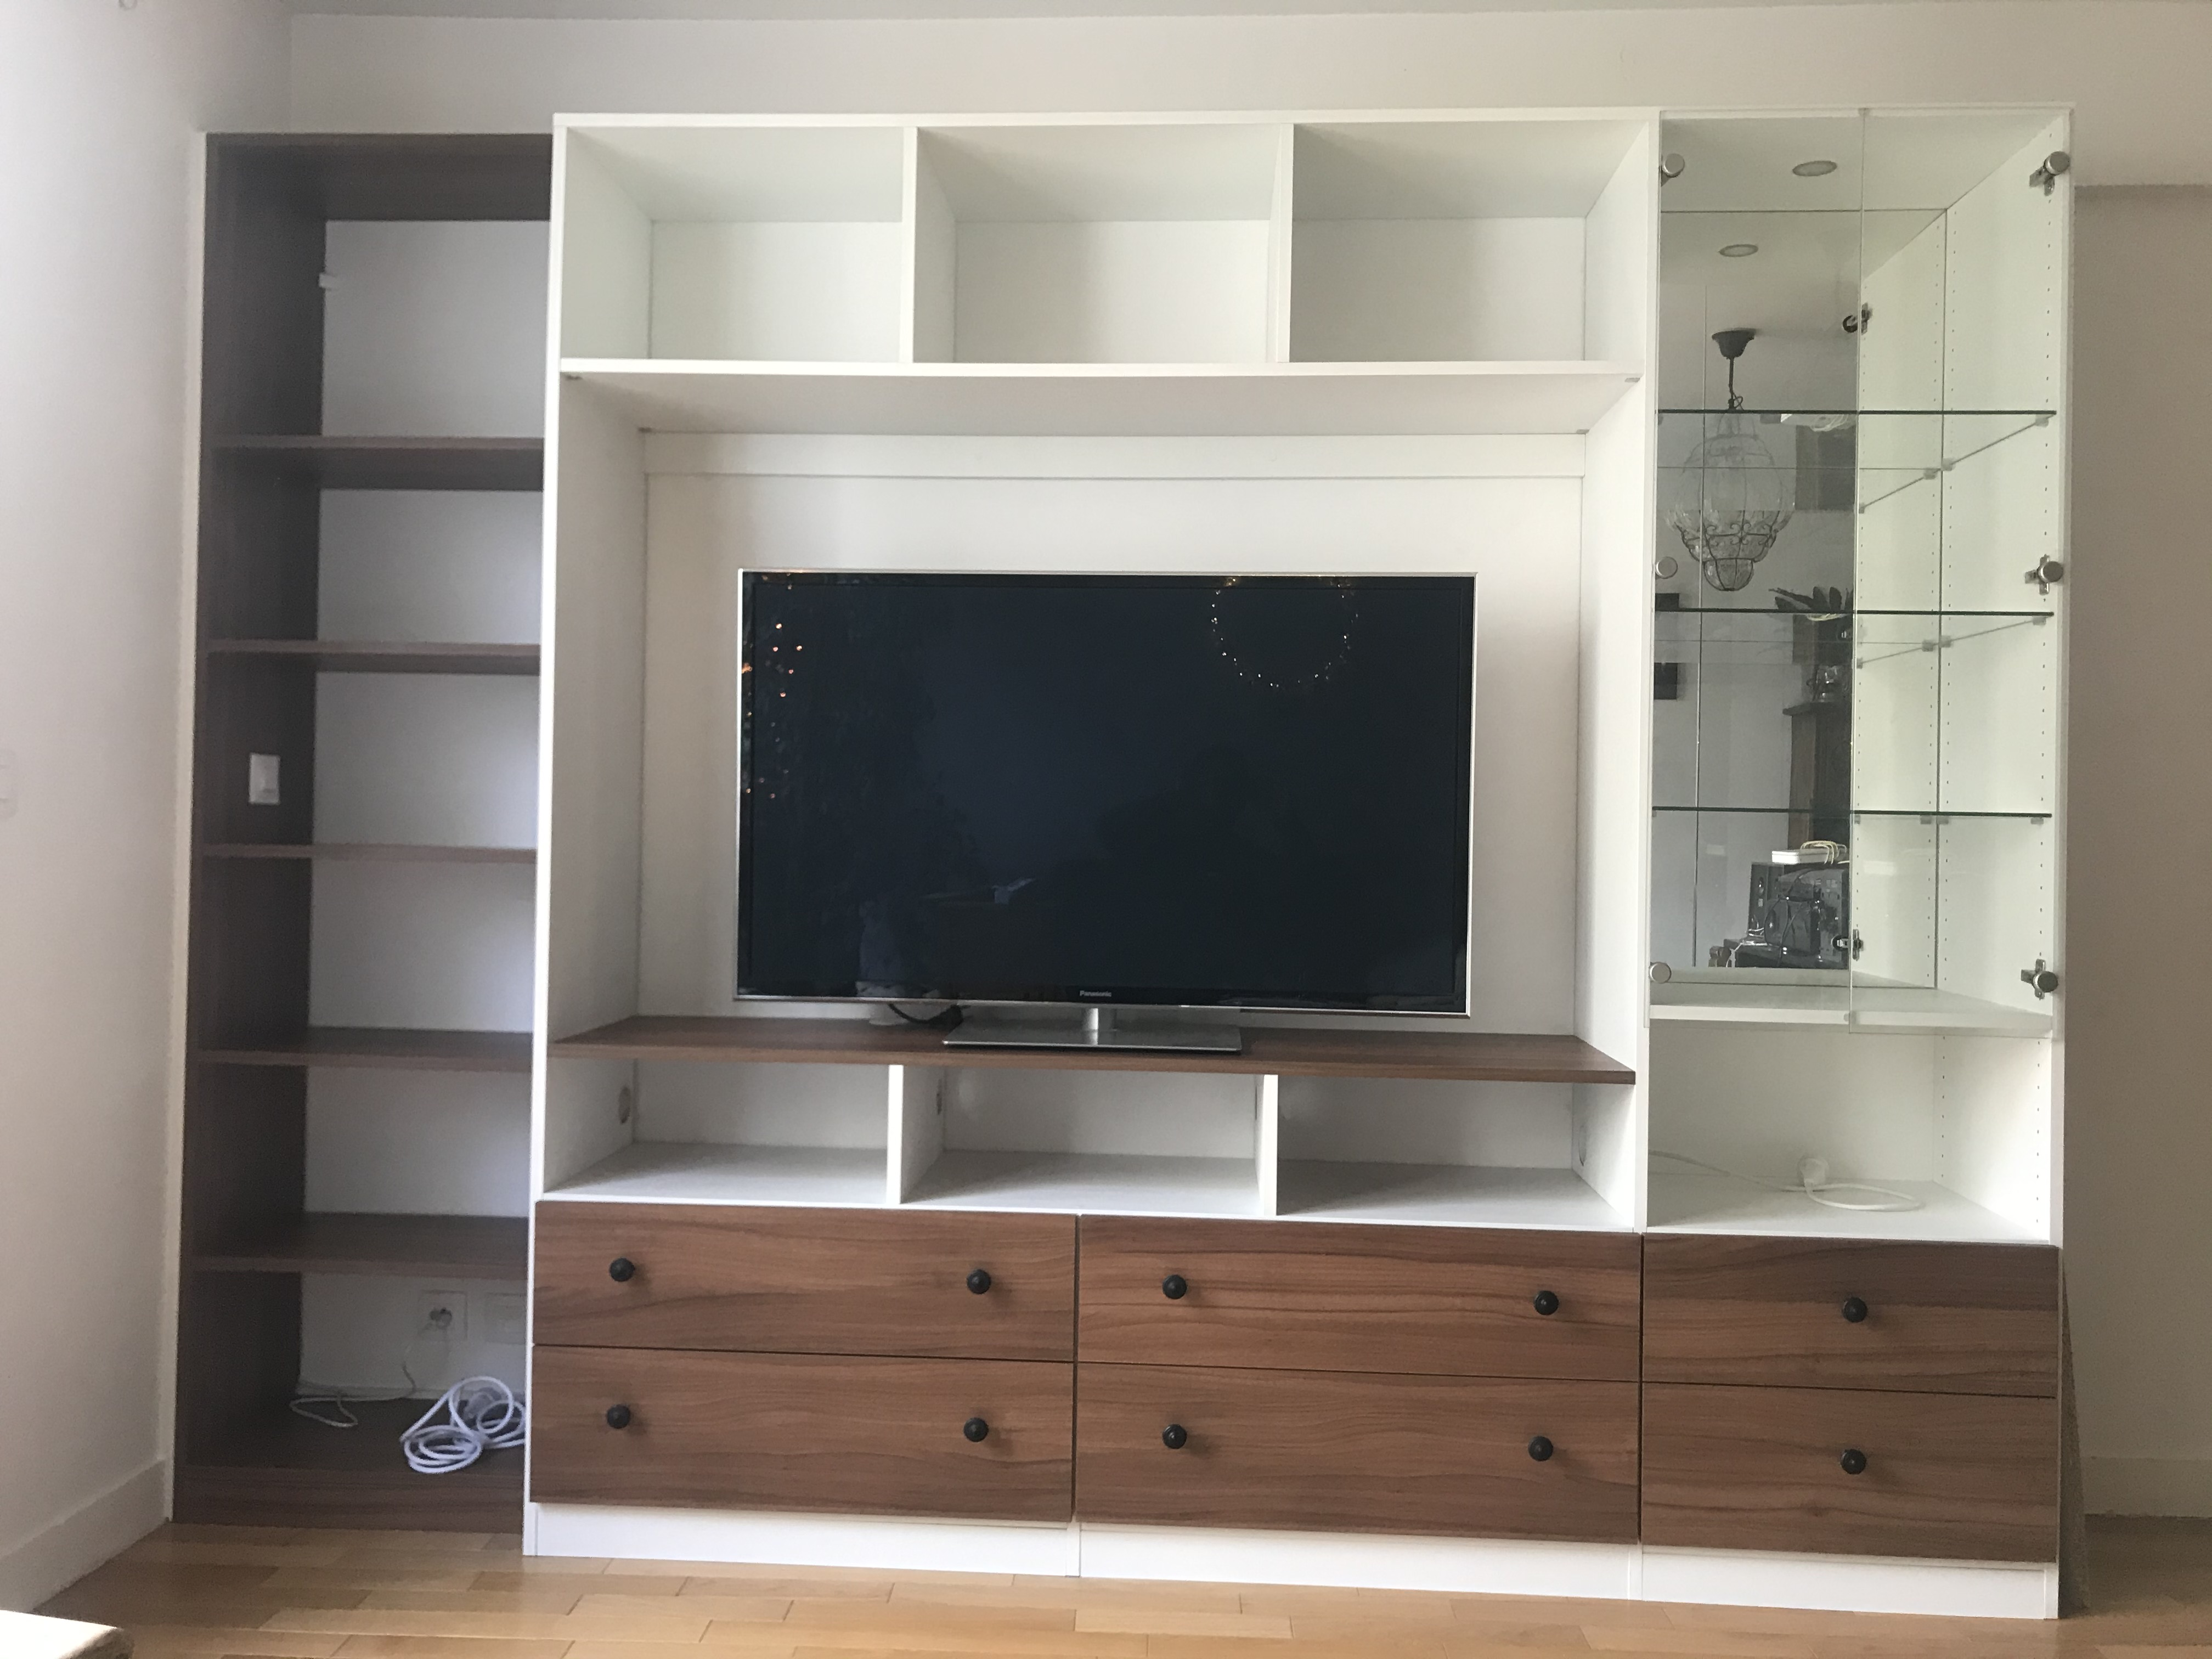 espace-placard-meubles-television-6